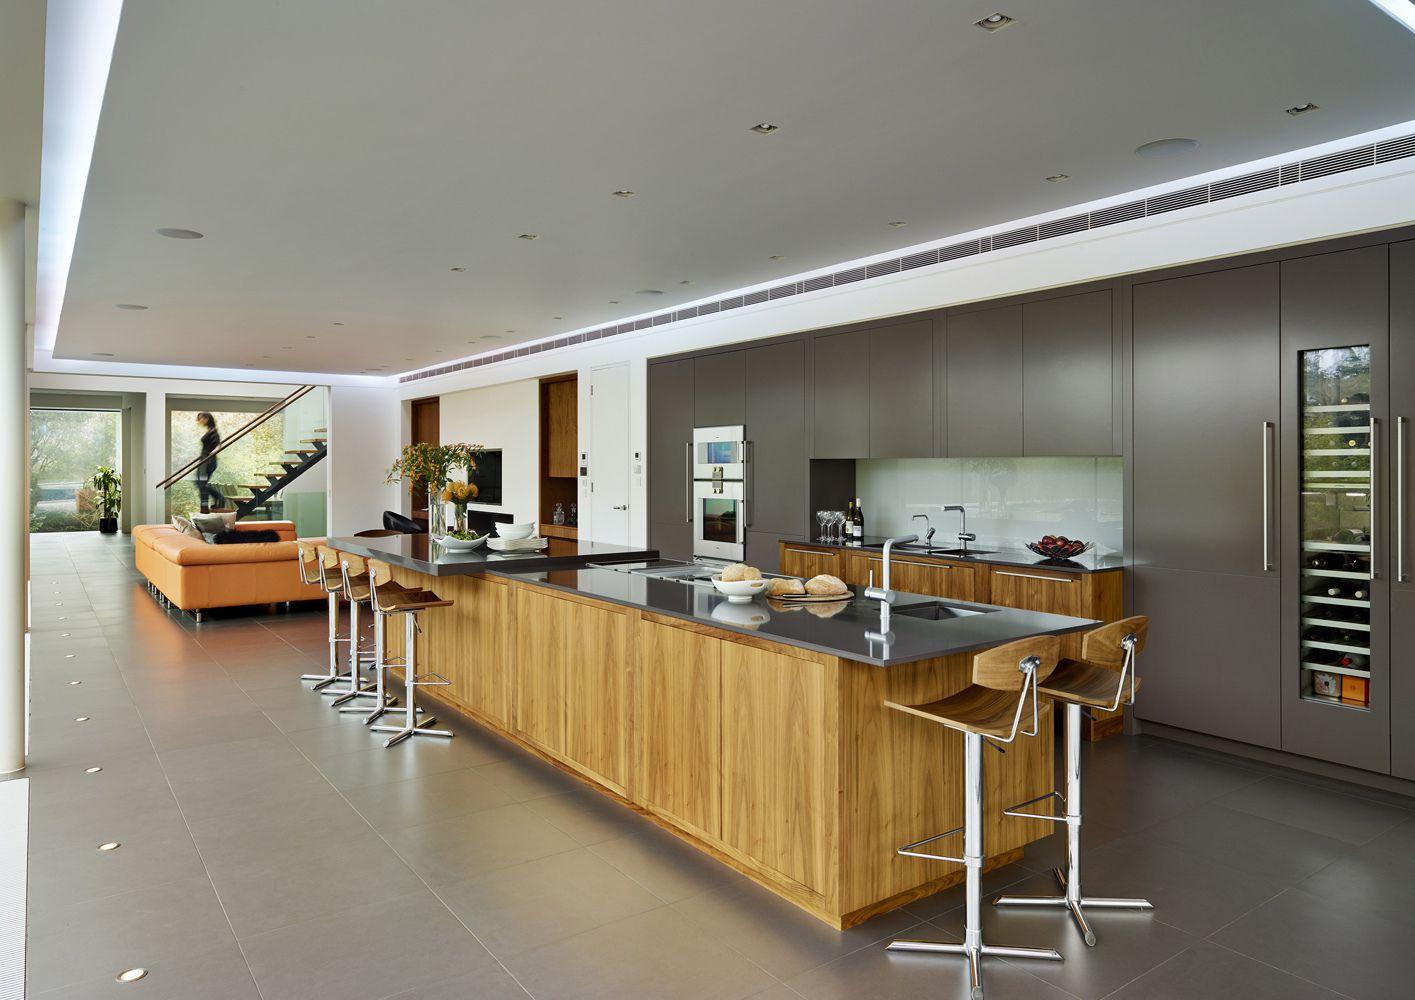 51b9e73cb3fc4bcf67000008_white-lodge-dyergrimes-architects_wl09chung